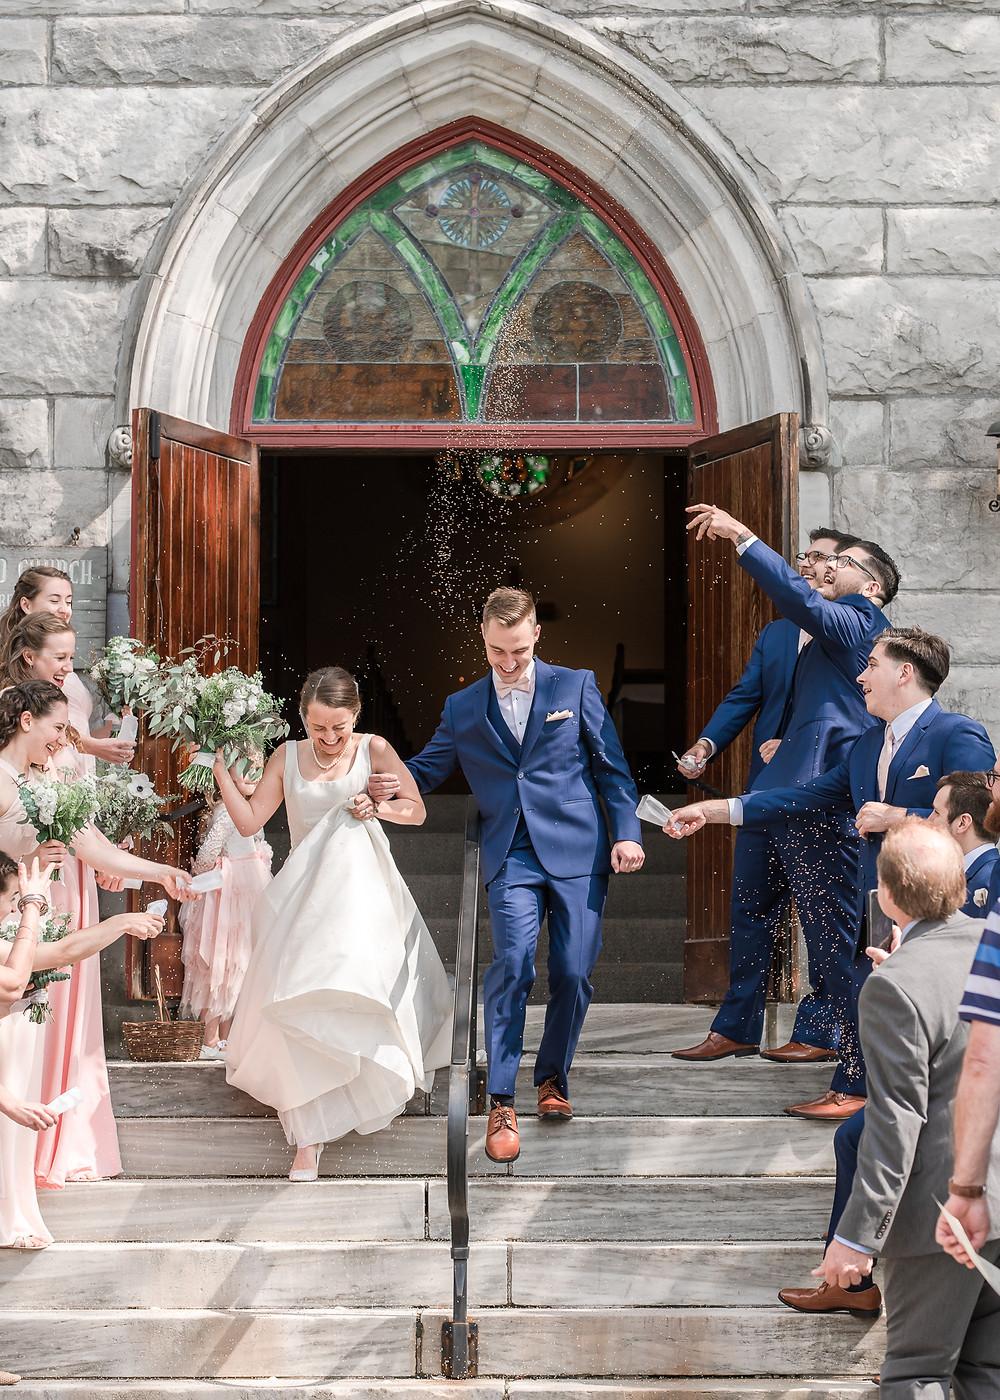 Dorset, Vermont wedding photography and birdseed toss